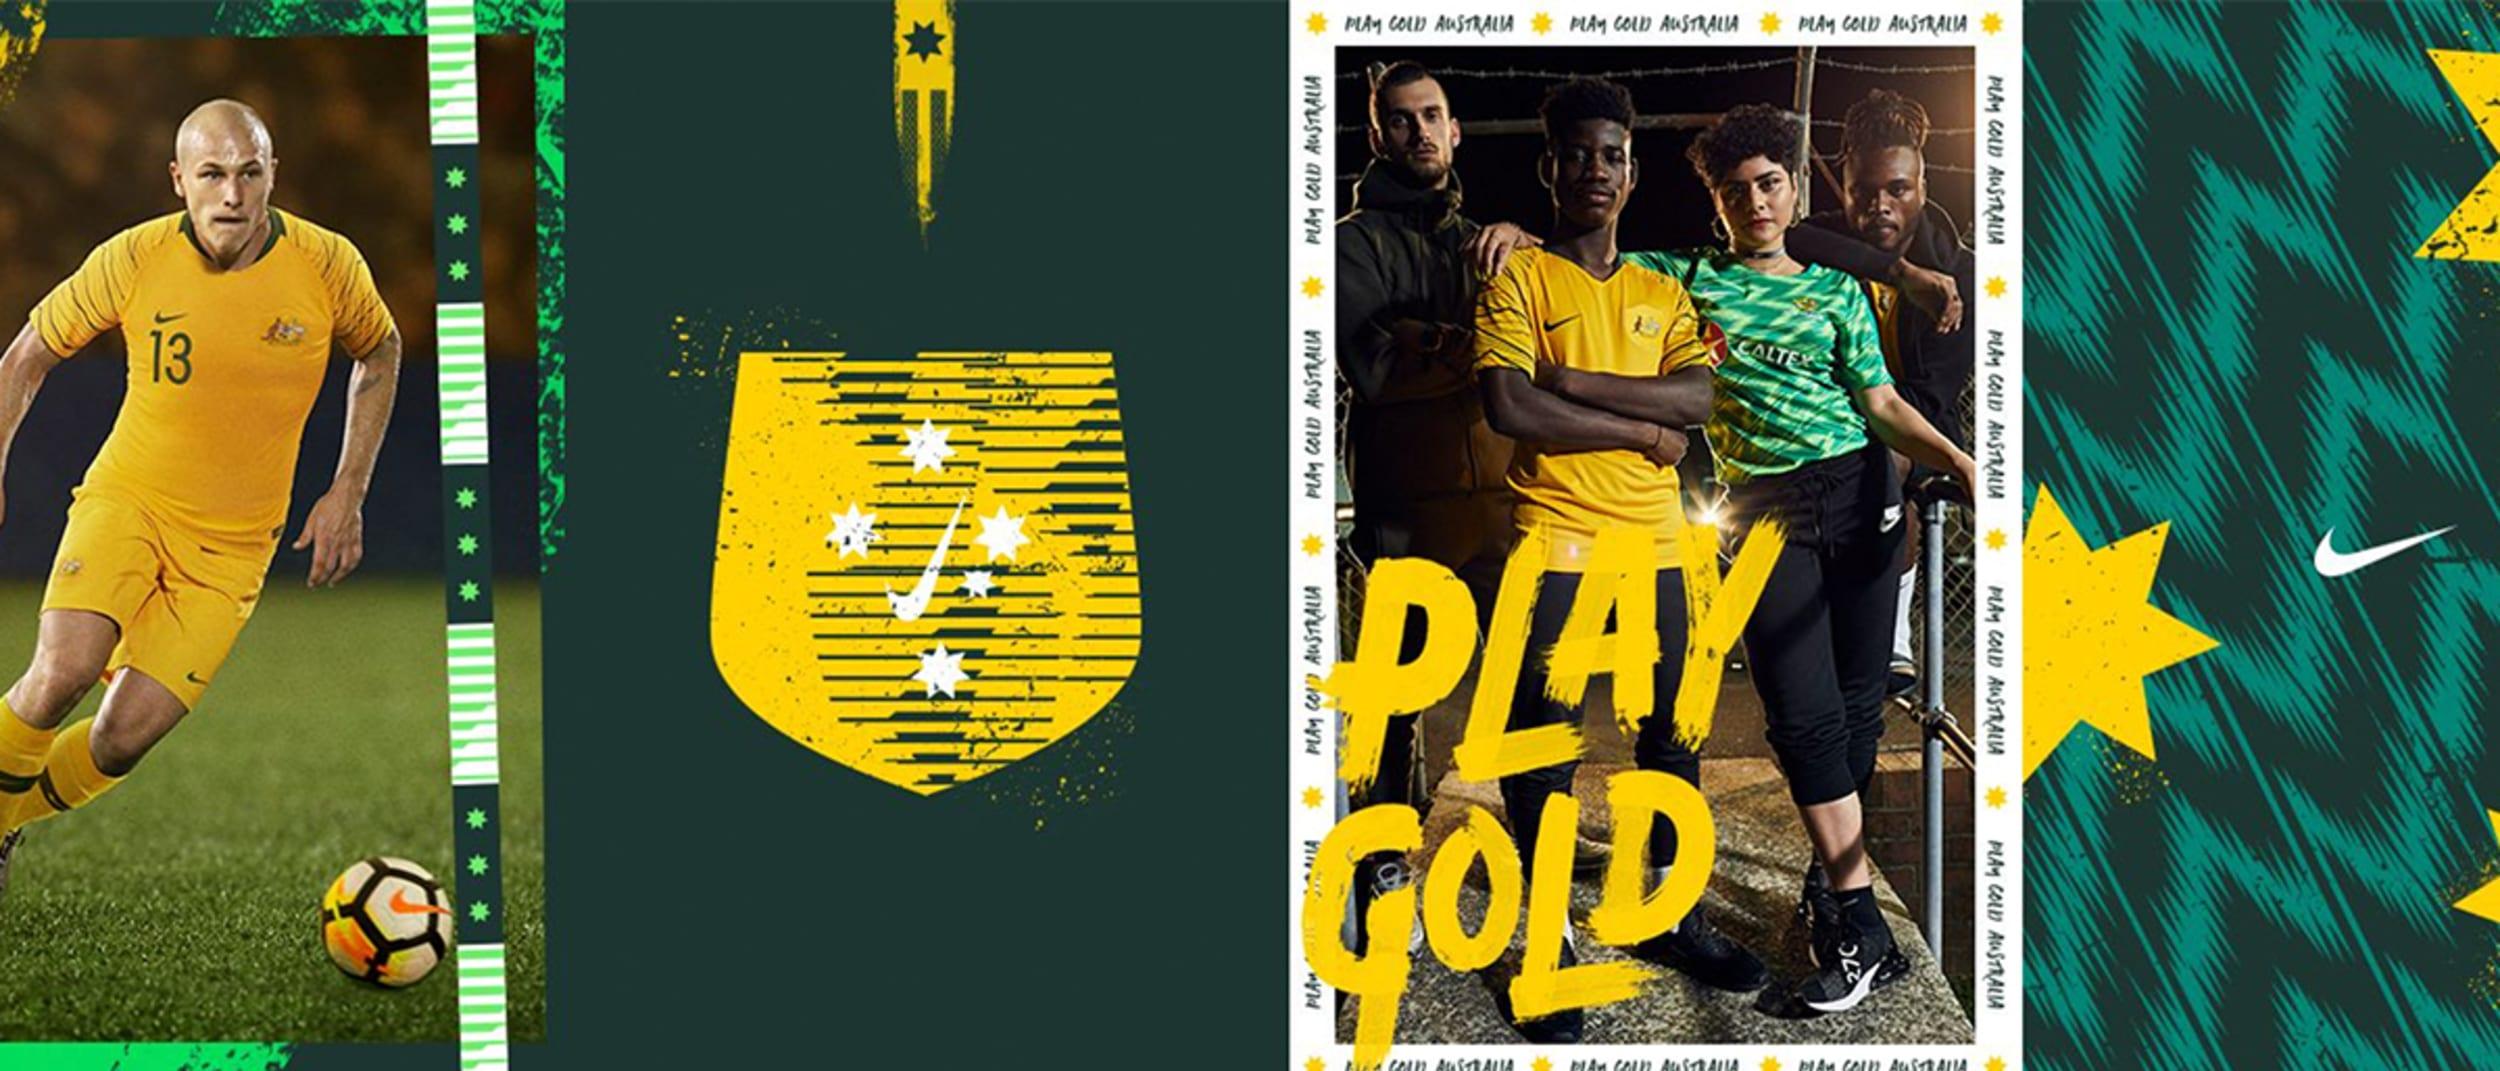 Nike football, play gold